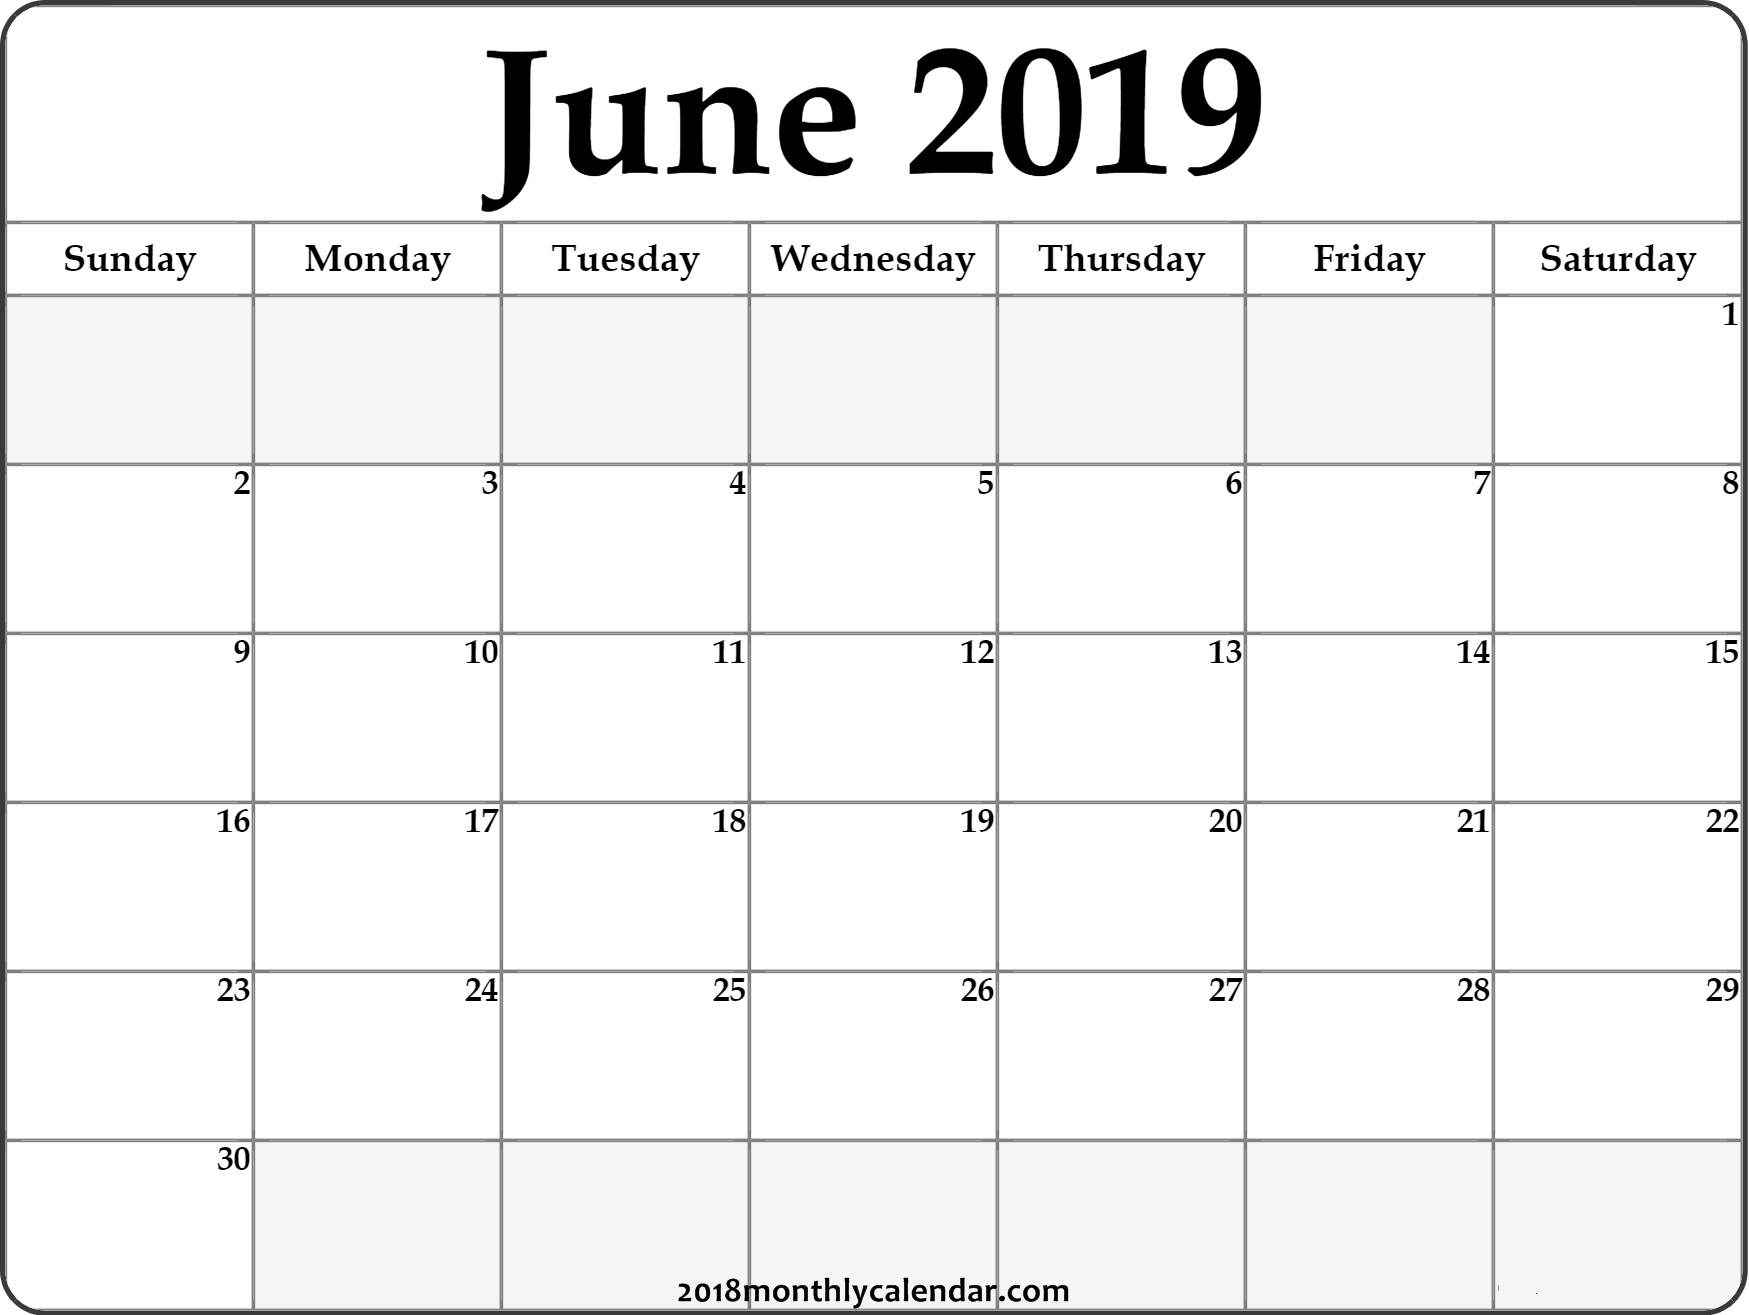 Download June 2019 Printable Calendar - Printable Blank throughout Editable Calendar July 2019-June 2020